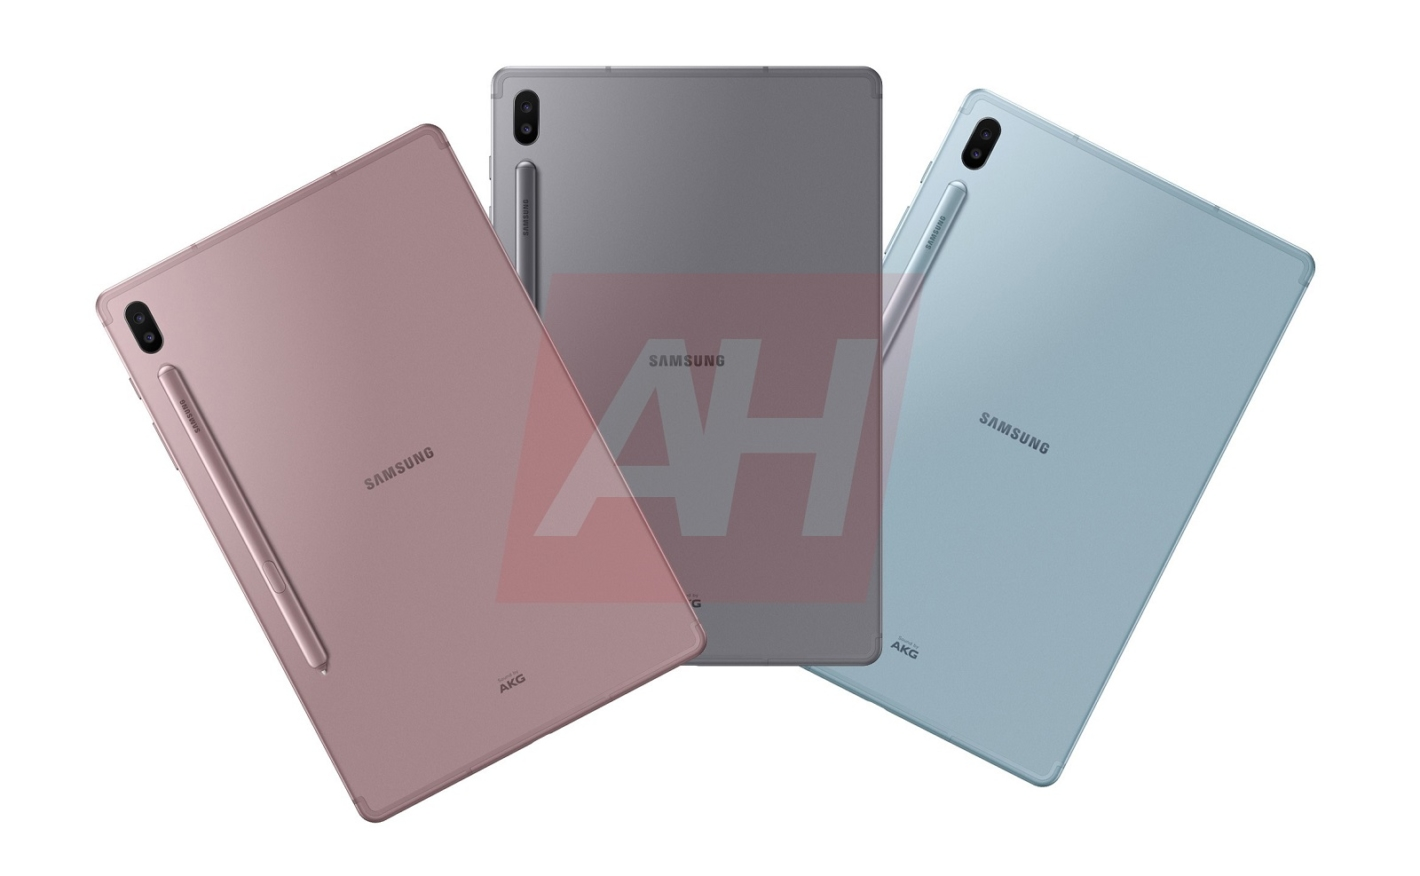 Samsung Galaxy Tab S6 / fot. AH